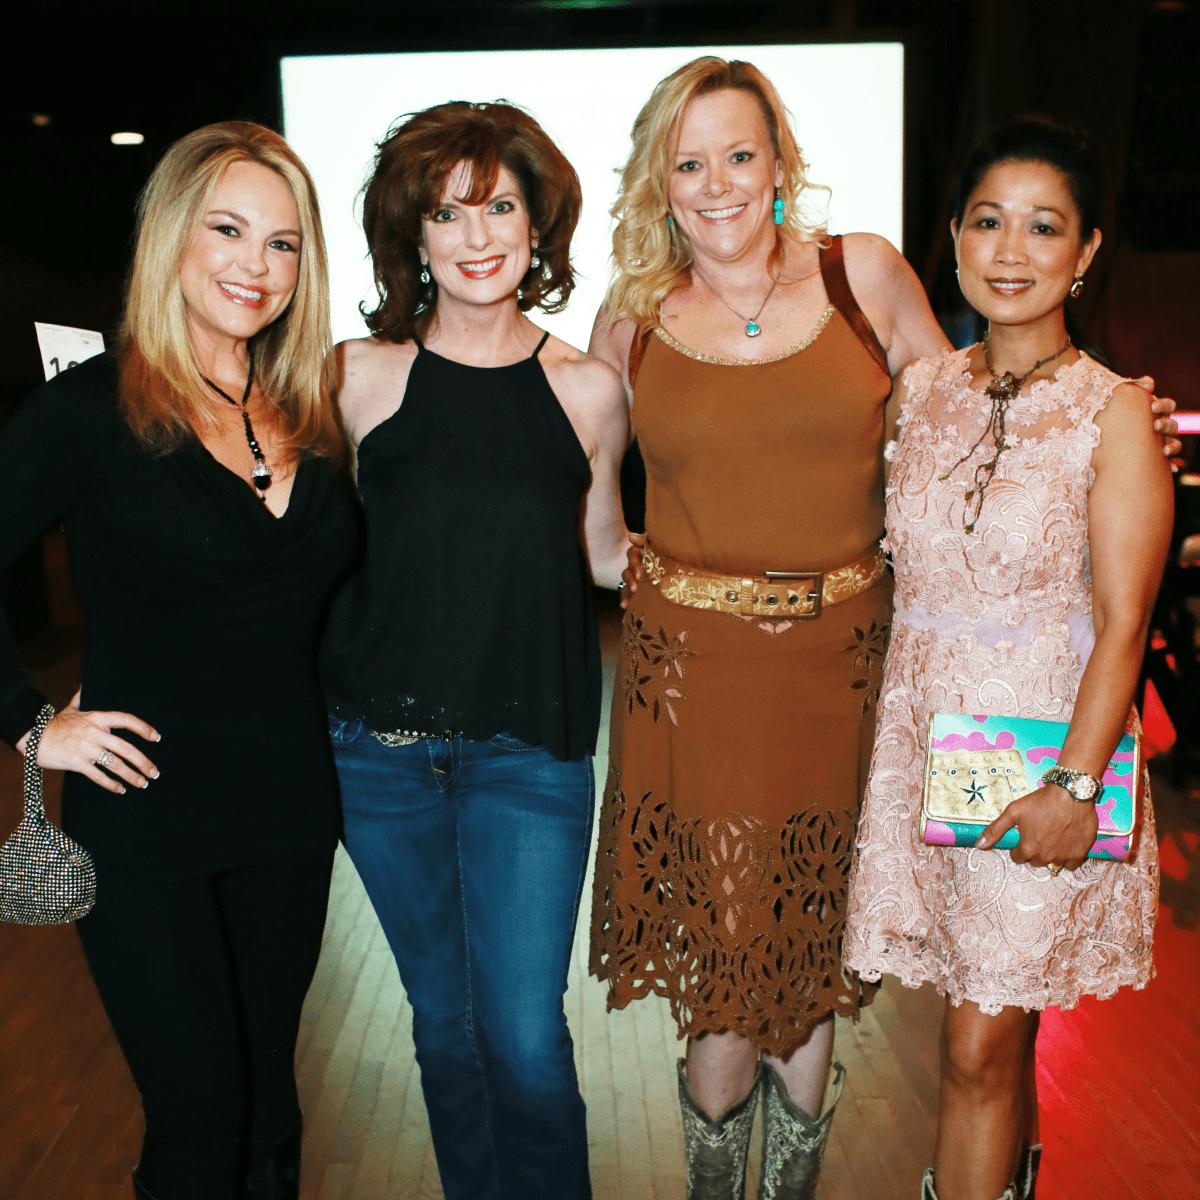 Aundrea Whalen, Natashia Mosier, Kristen Greenberg, Kunthear Mam-Douglas